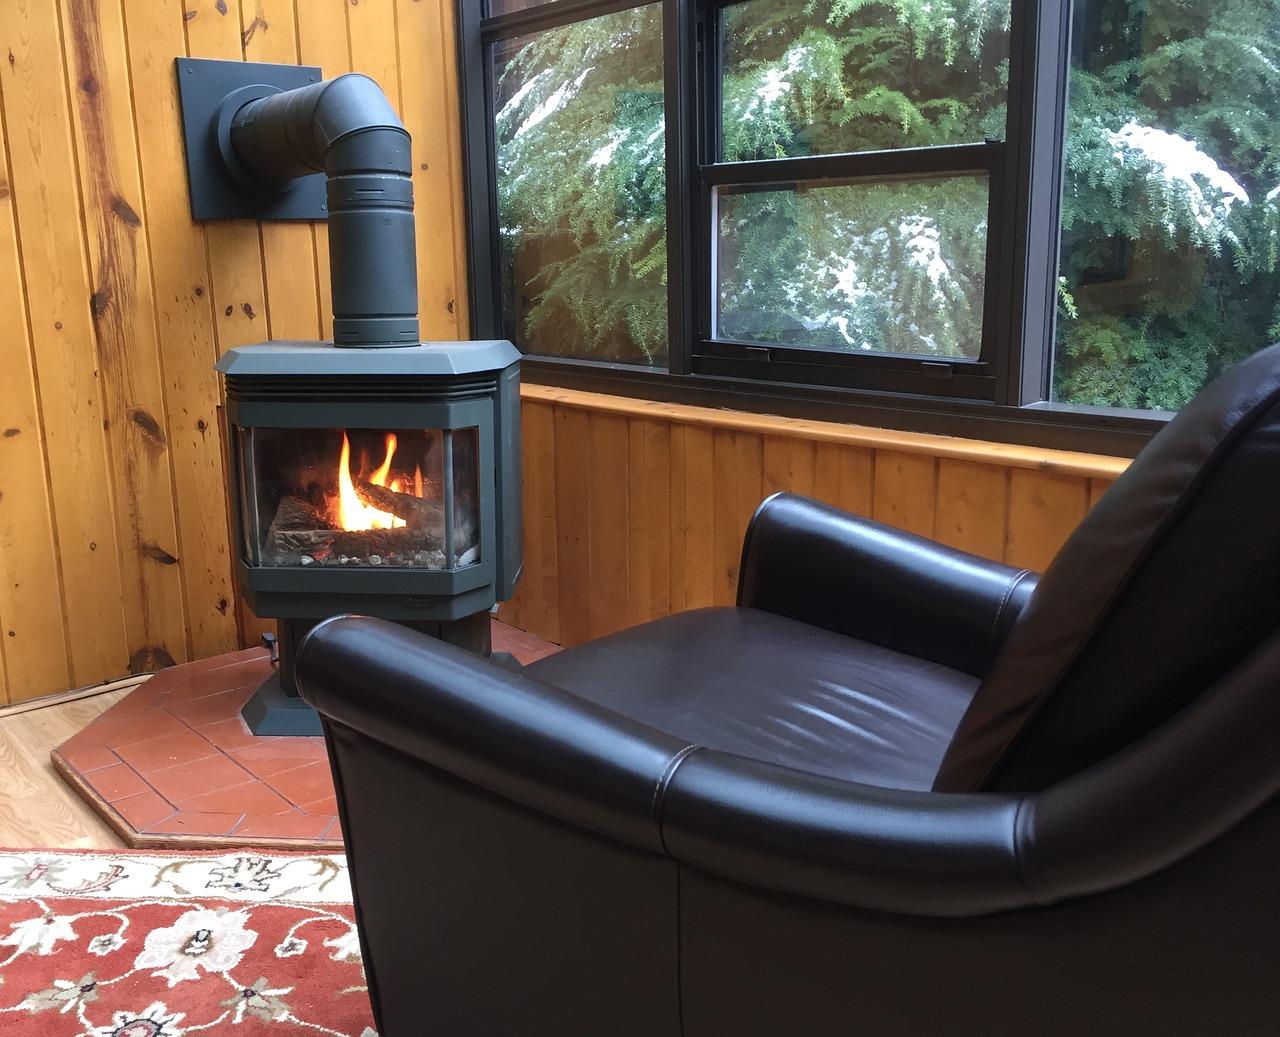 warm cozy room with pellet stove